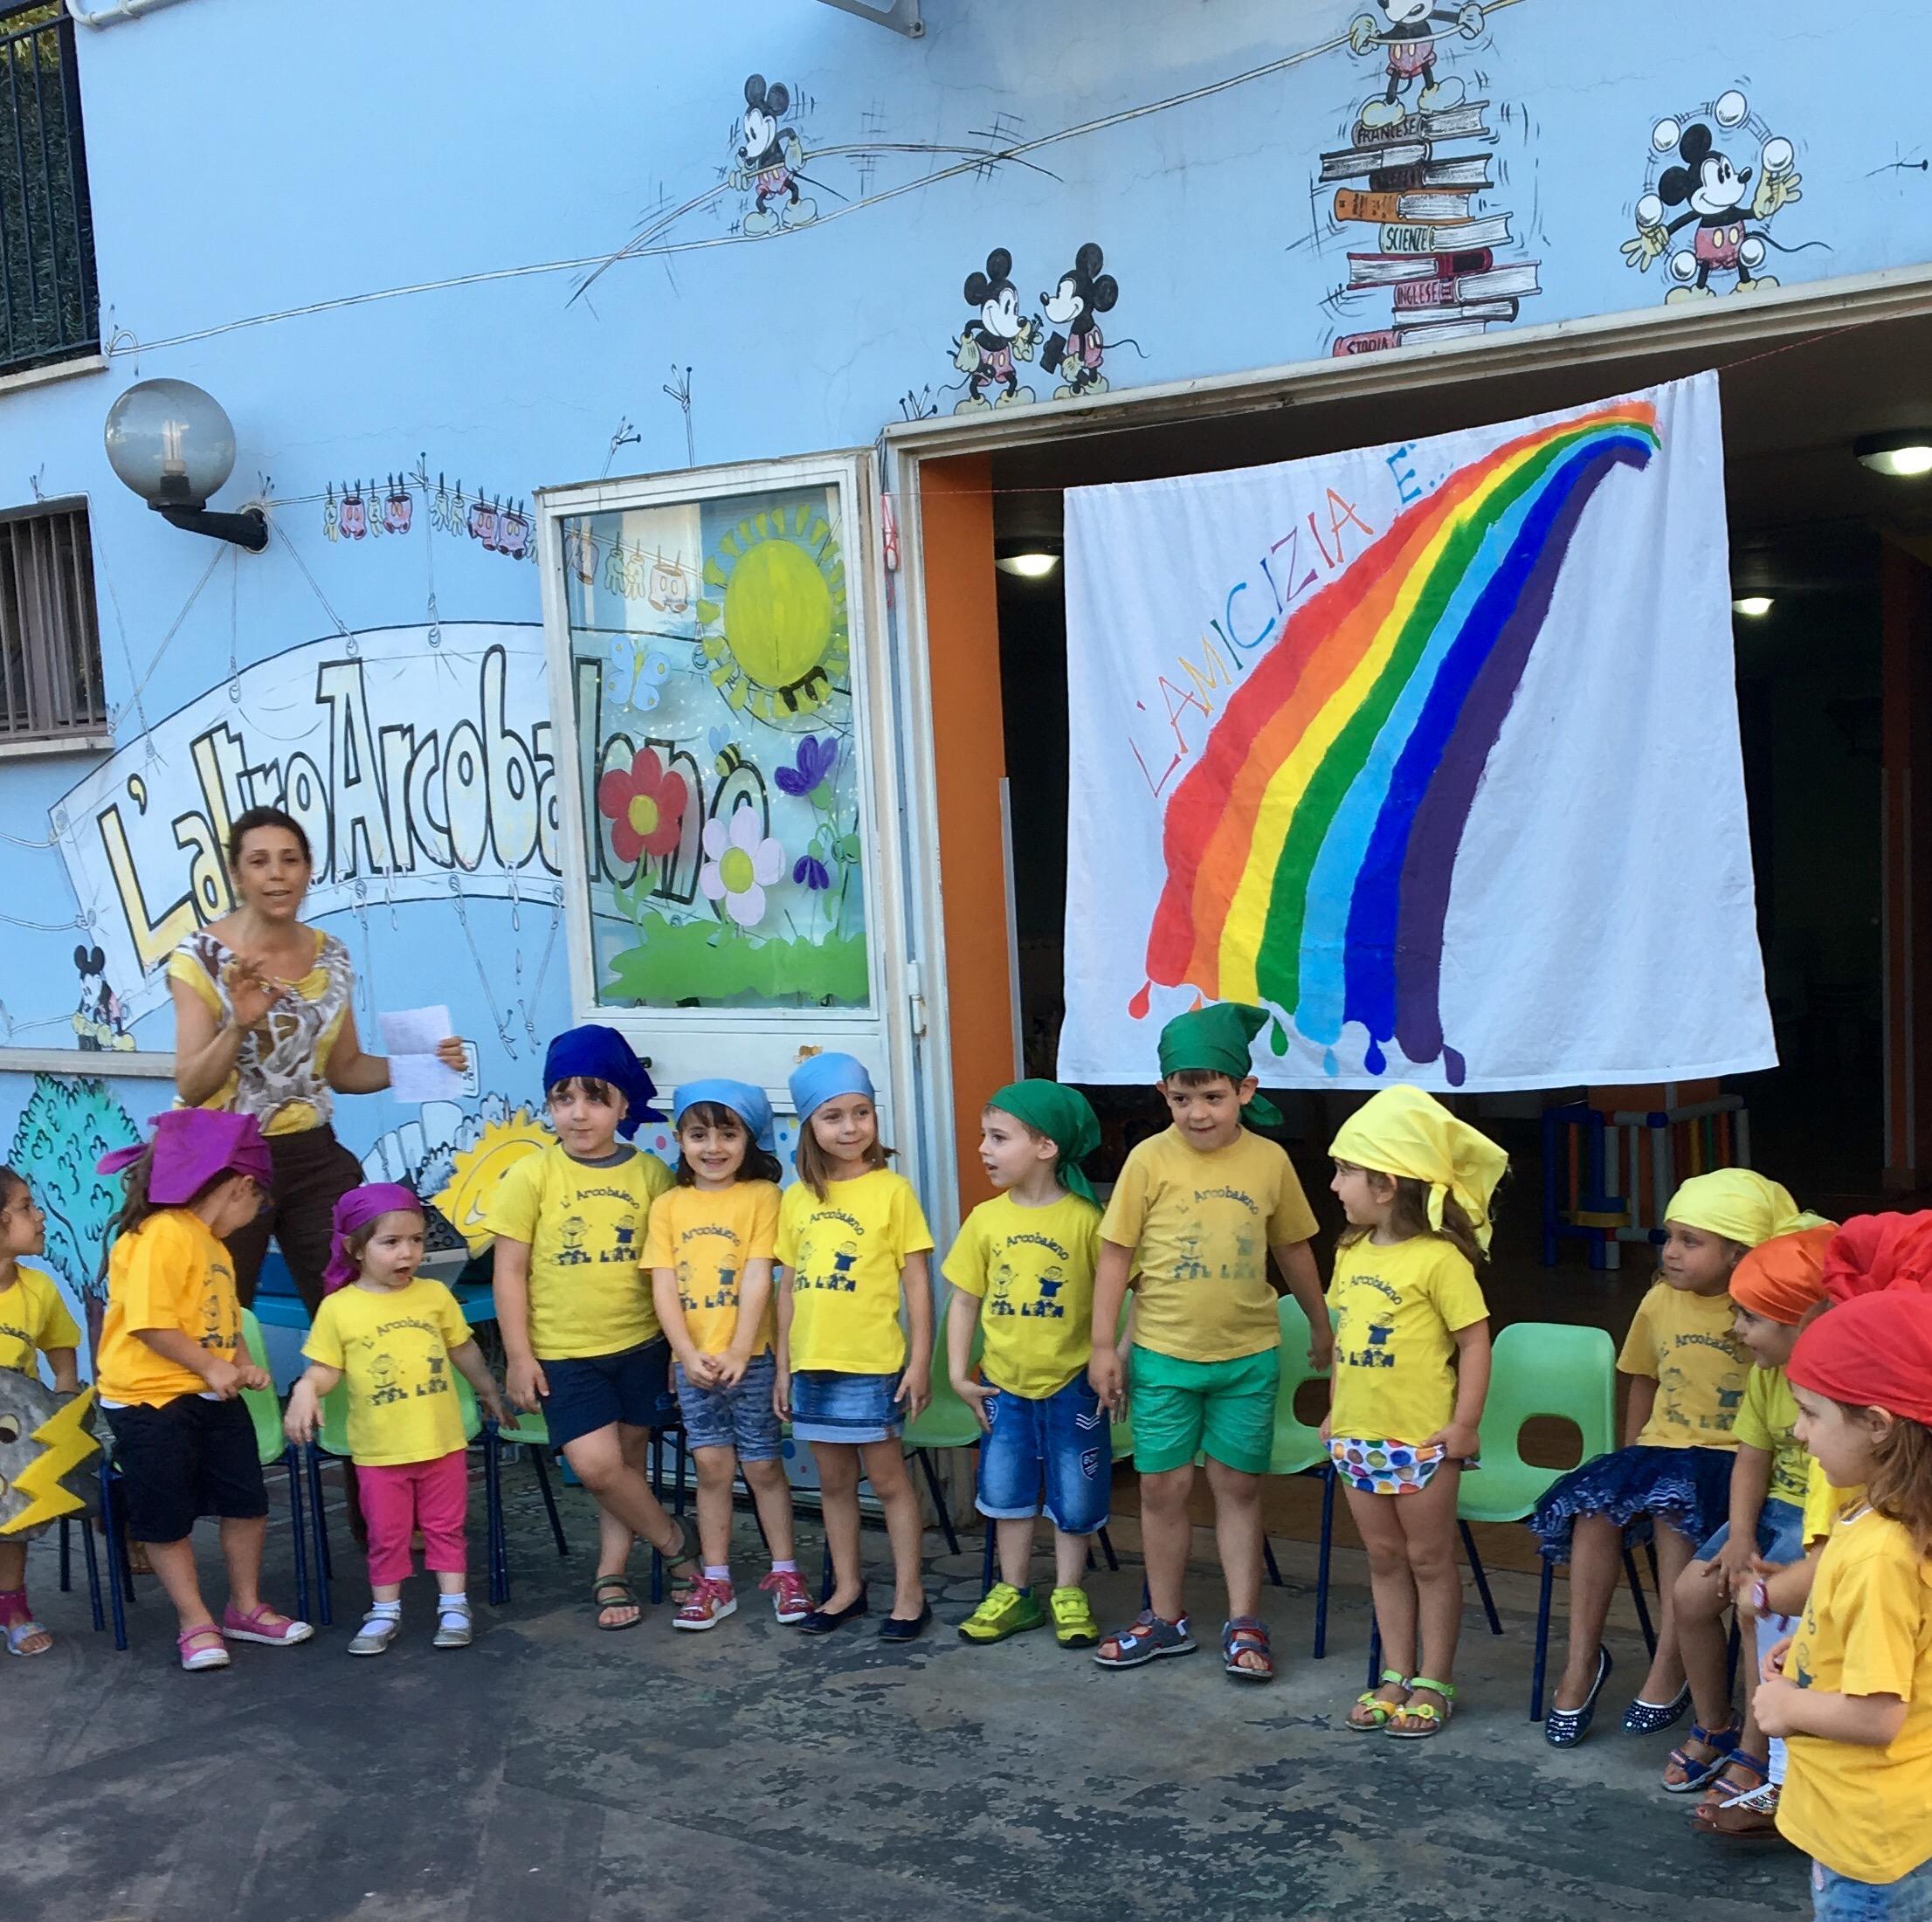 L'Arcobaleno - SALA PER FESTE